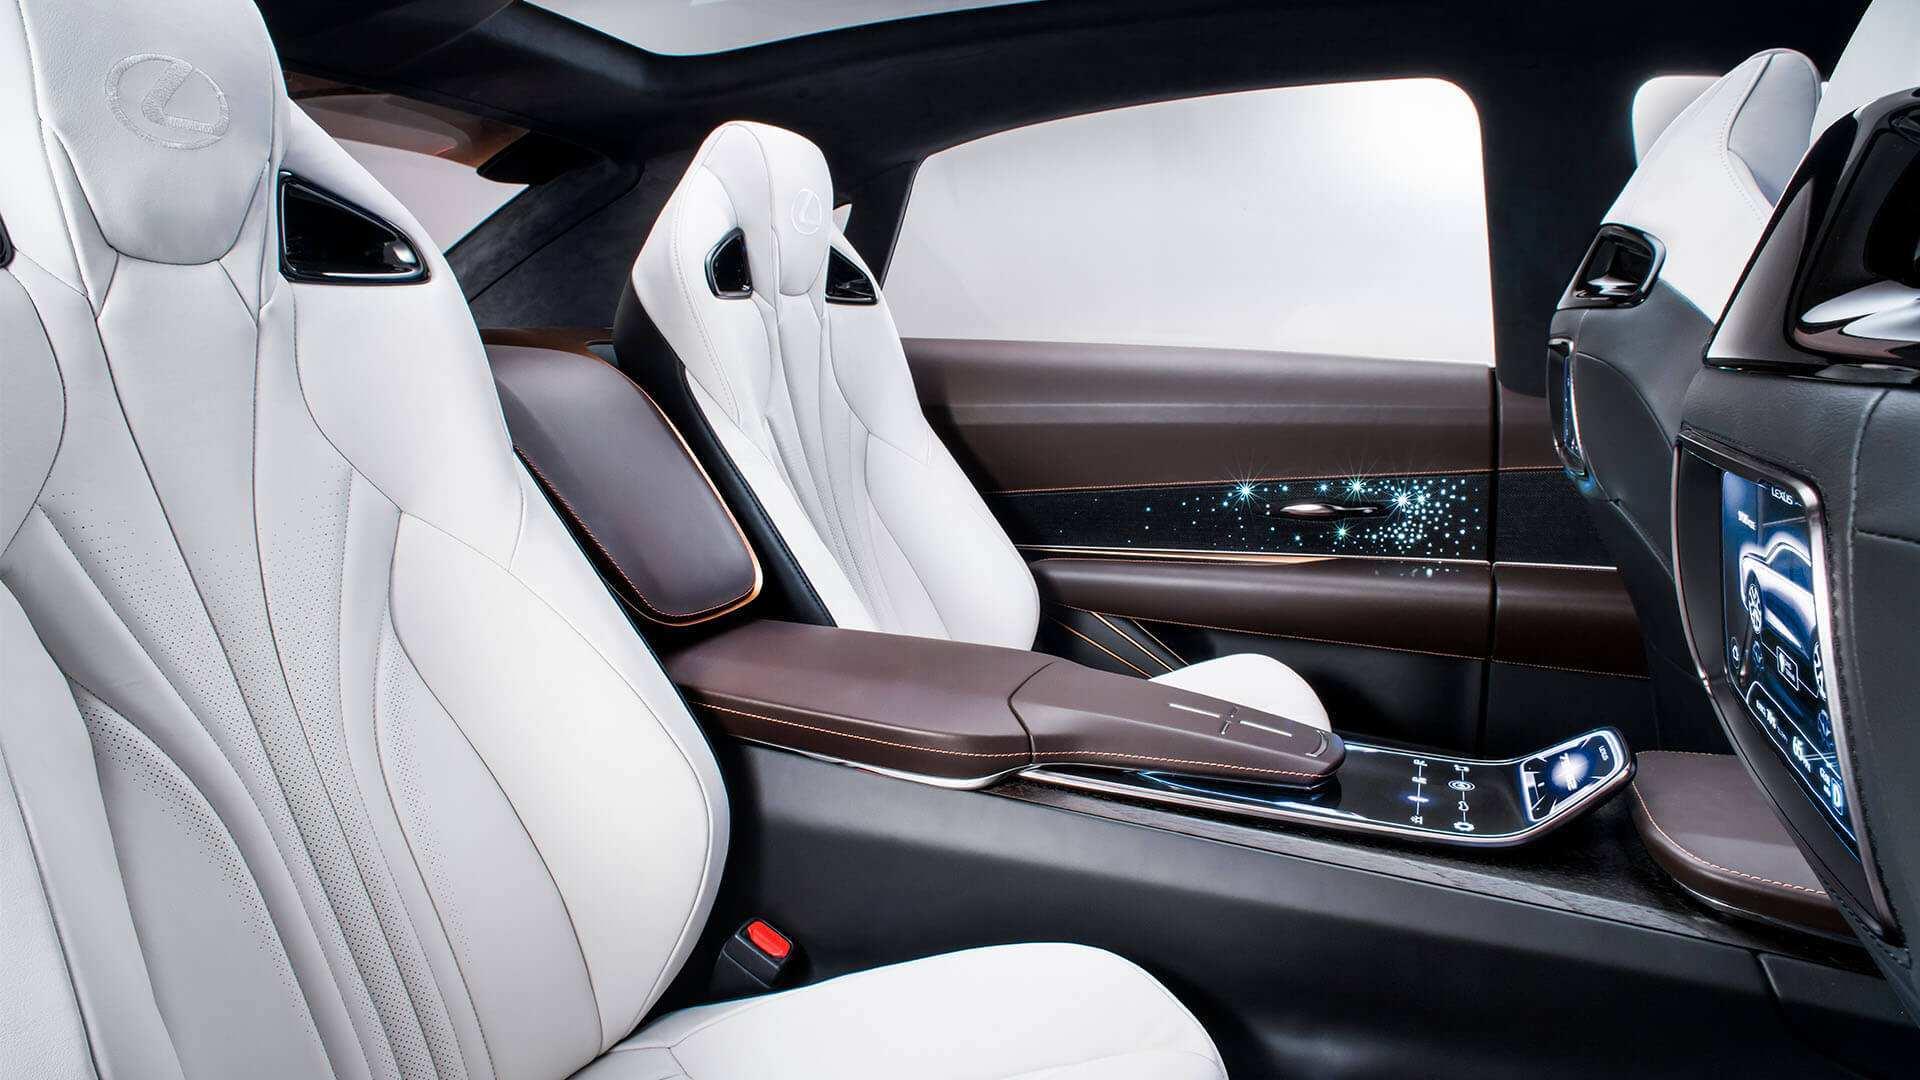 45 All New Lexus Lf 1 Limitless 2020 Performance by Lexus Lf 1 Limitless 2020